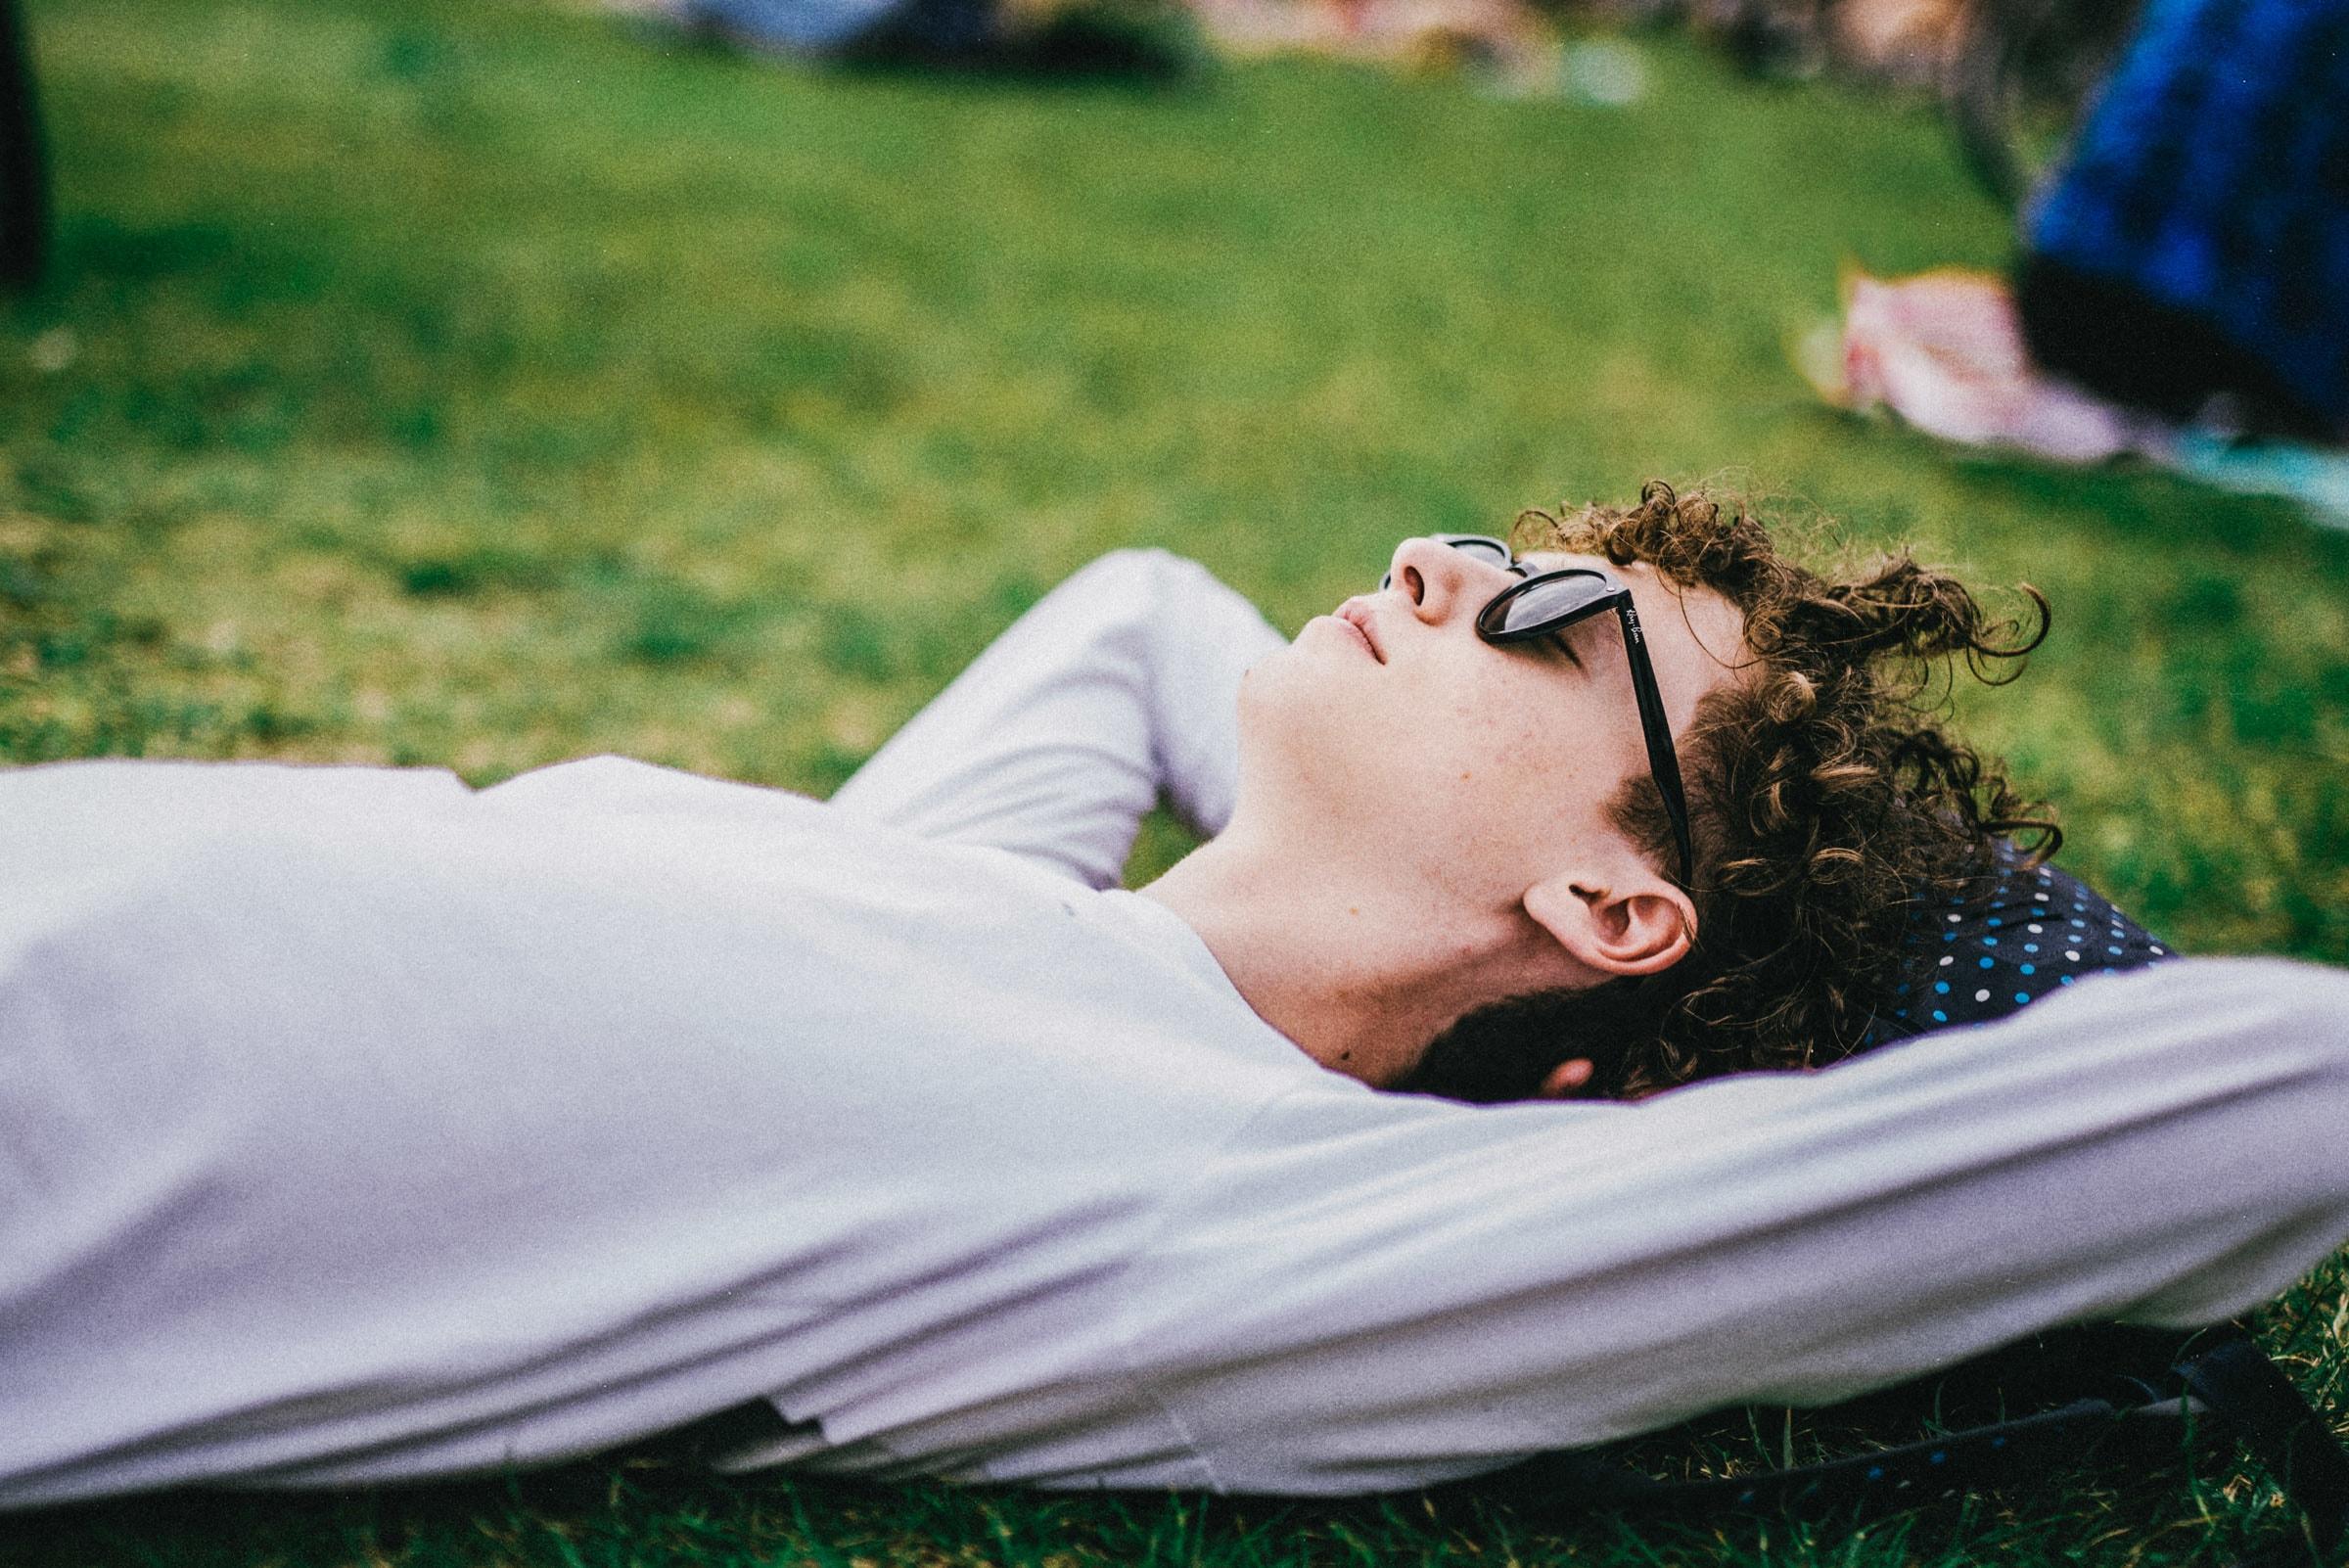 Guy lying on ground